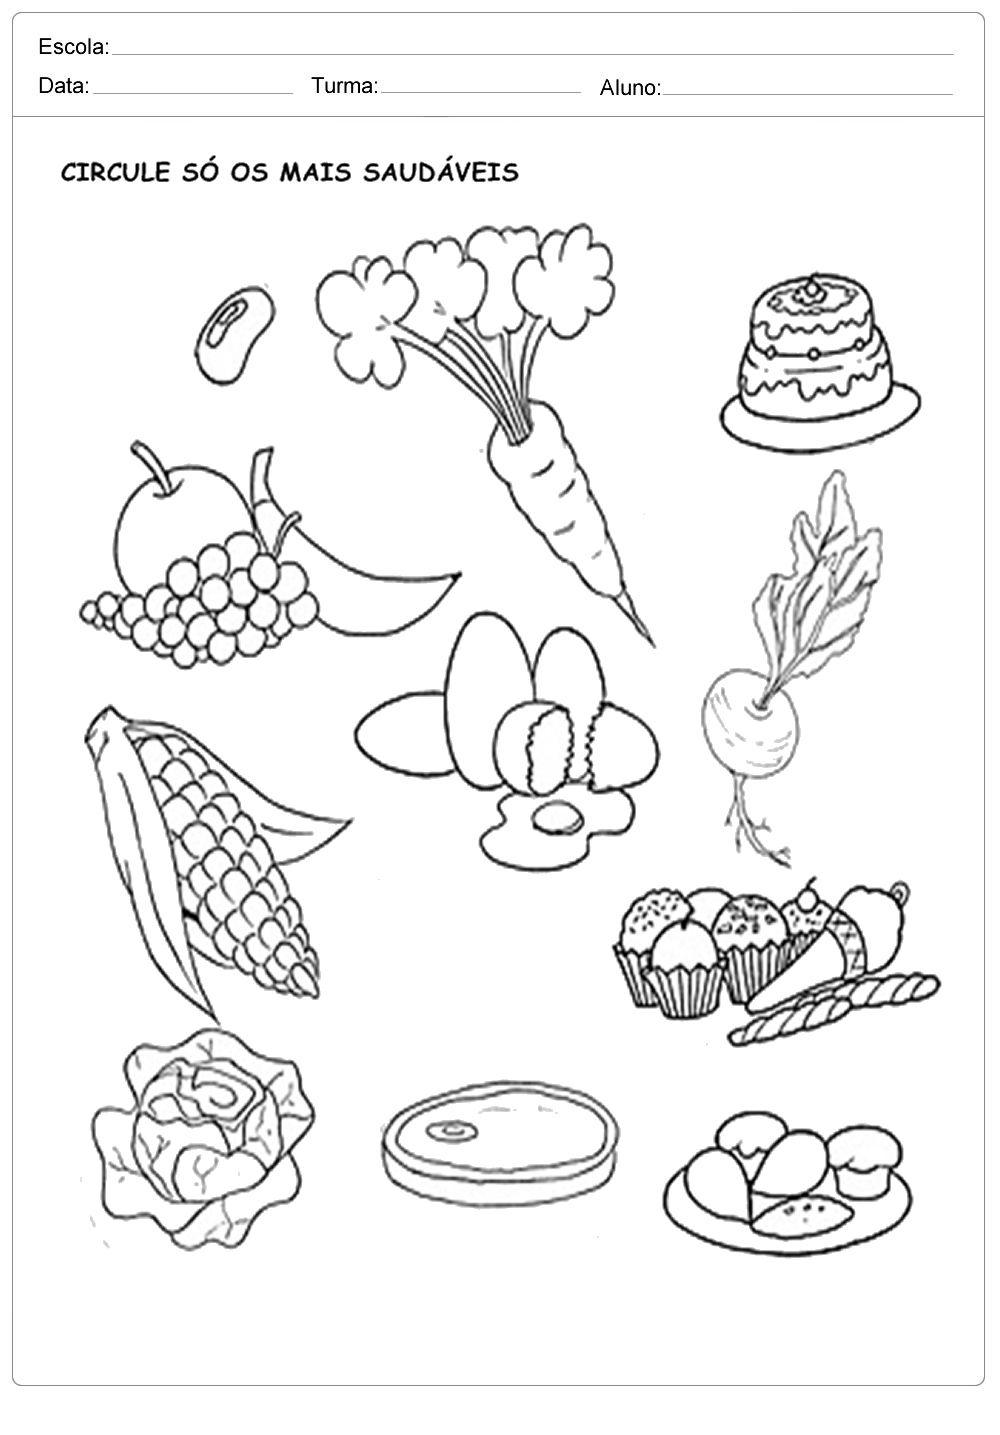 Circule Os Alimentos Saudaveis Projeto Alimentacao Saudavel Dia